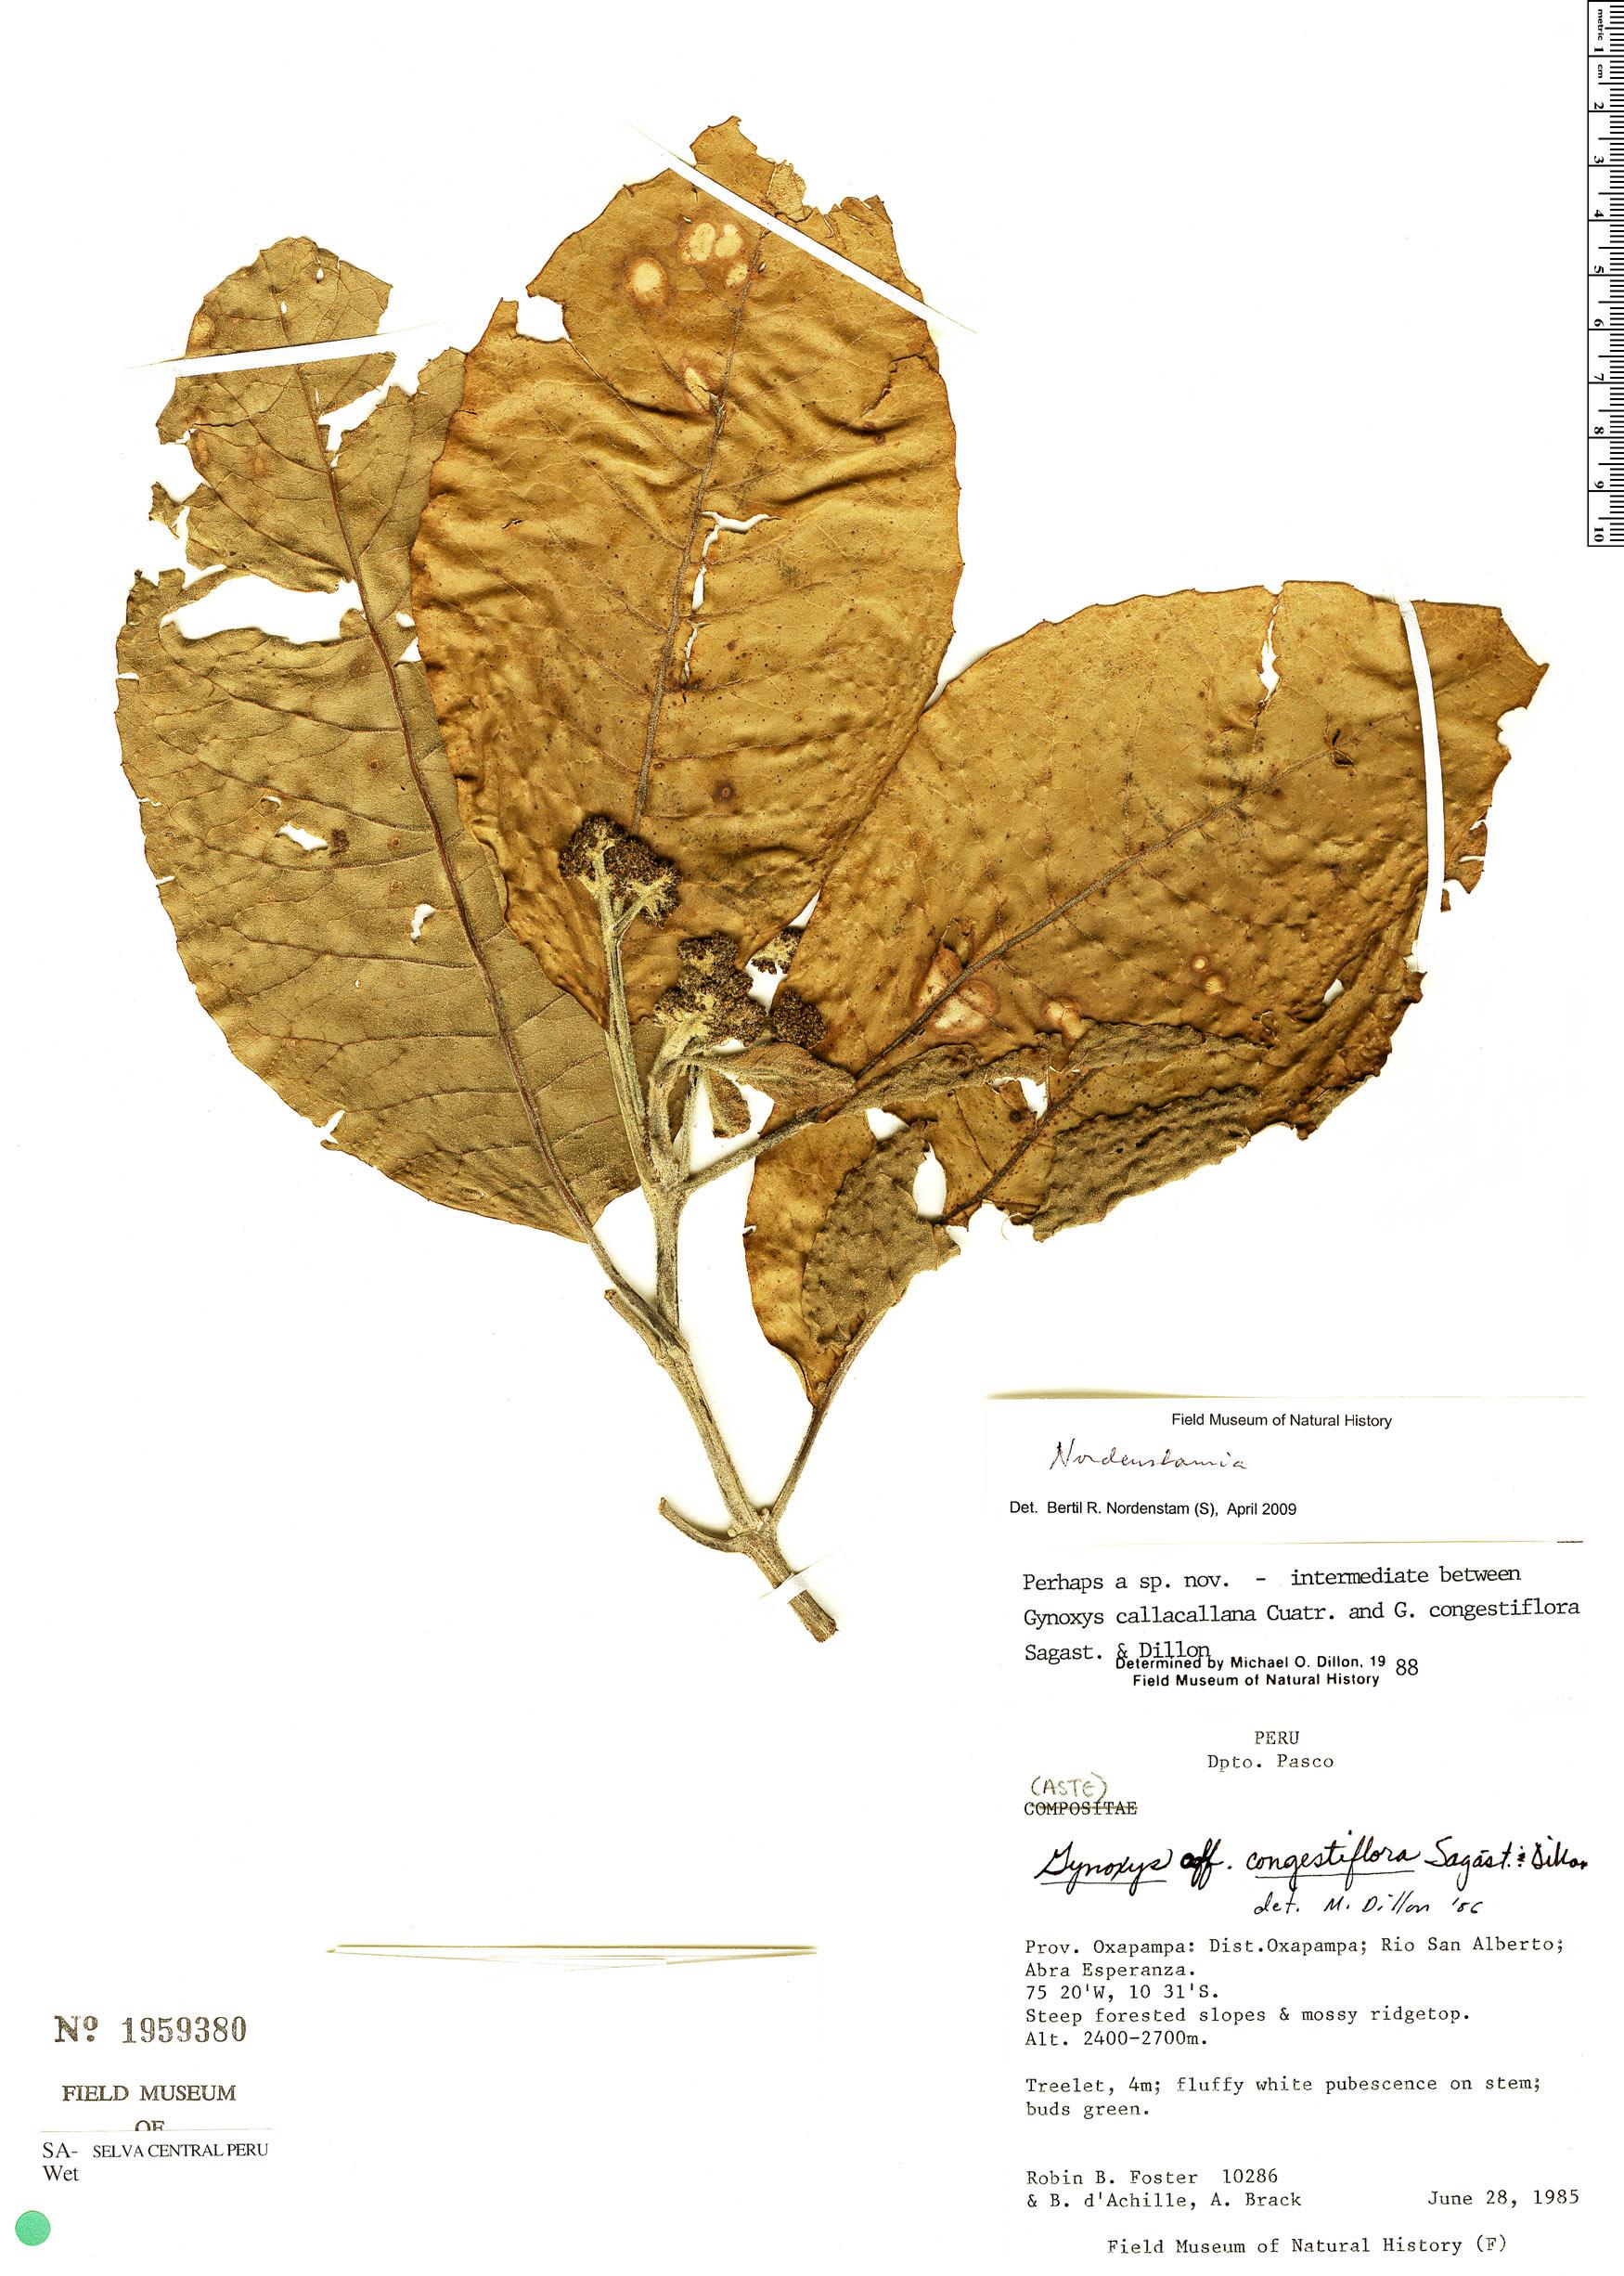 Espécimen: Nordenstamia